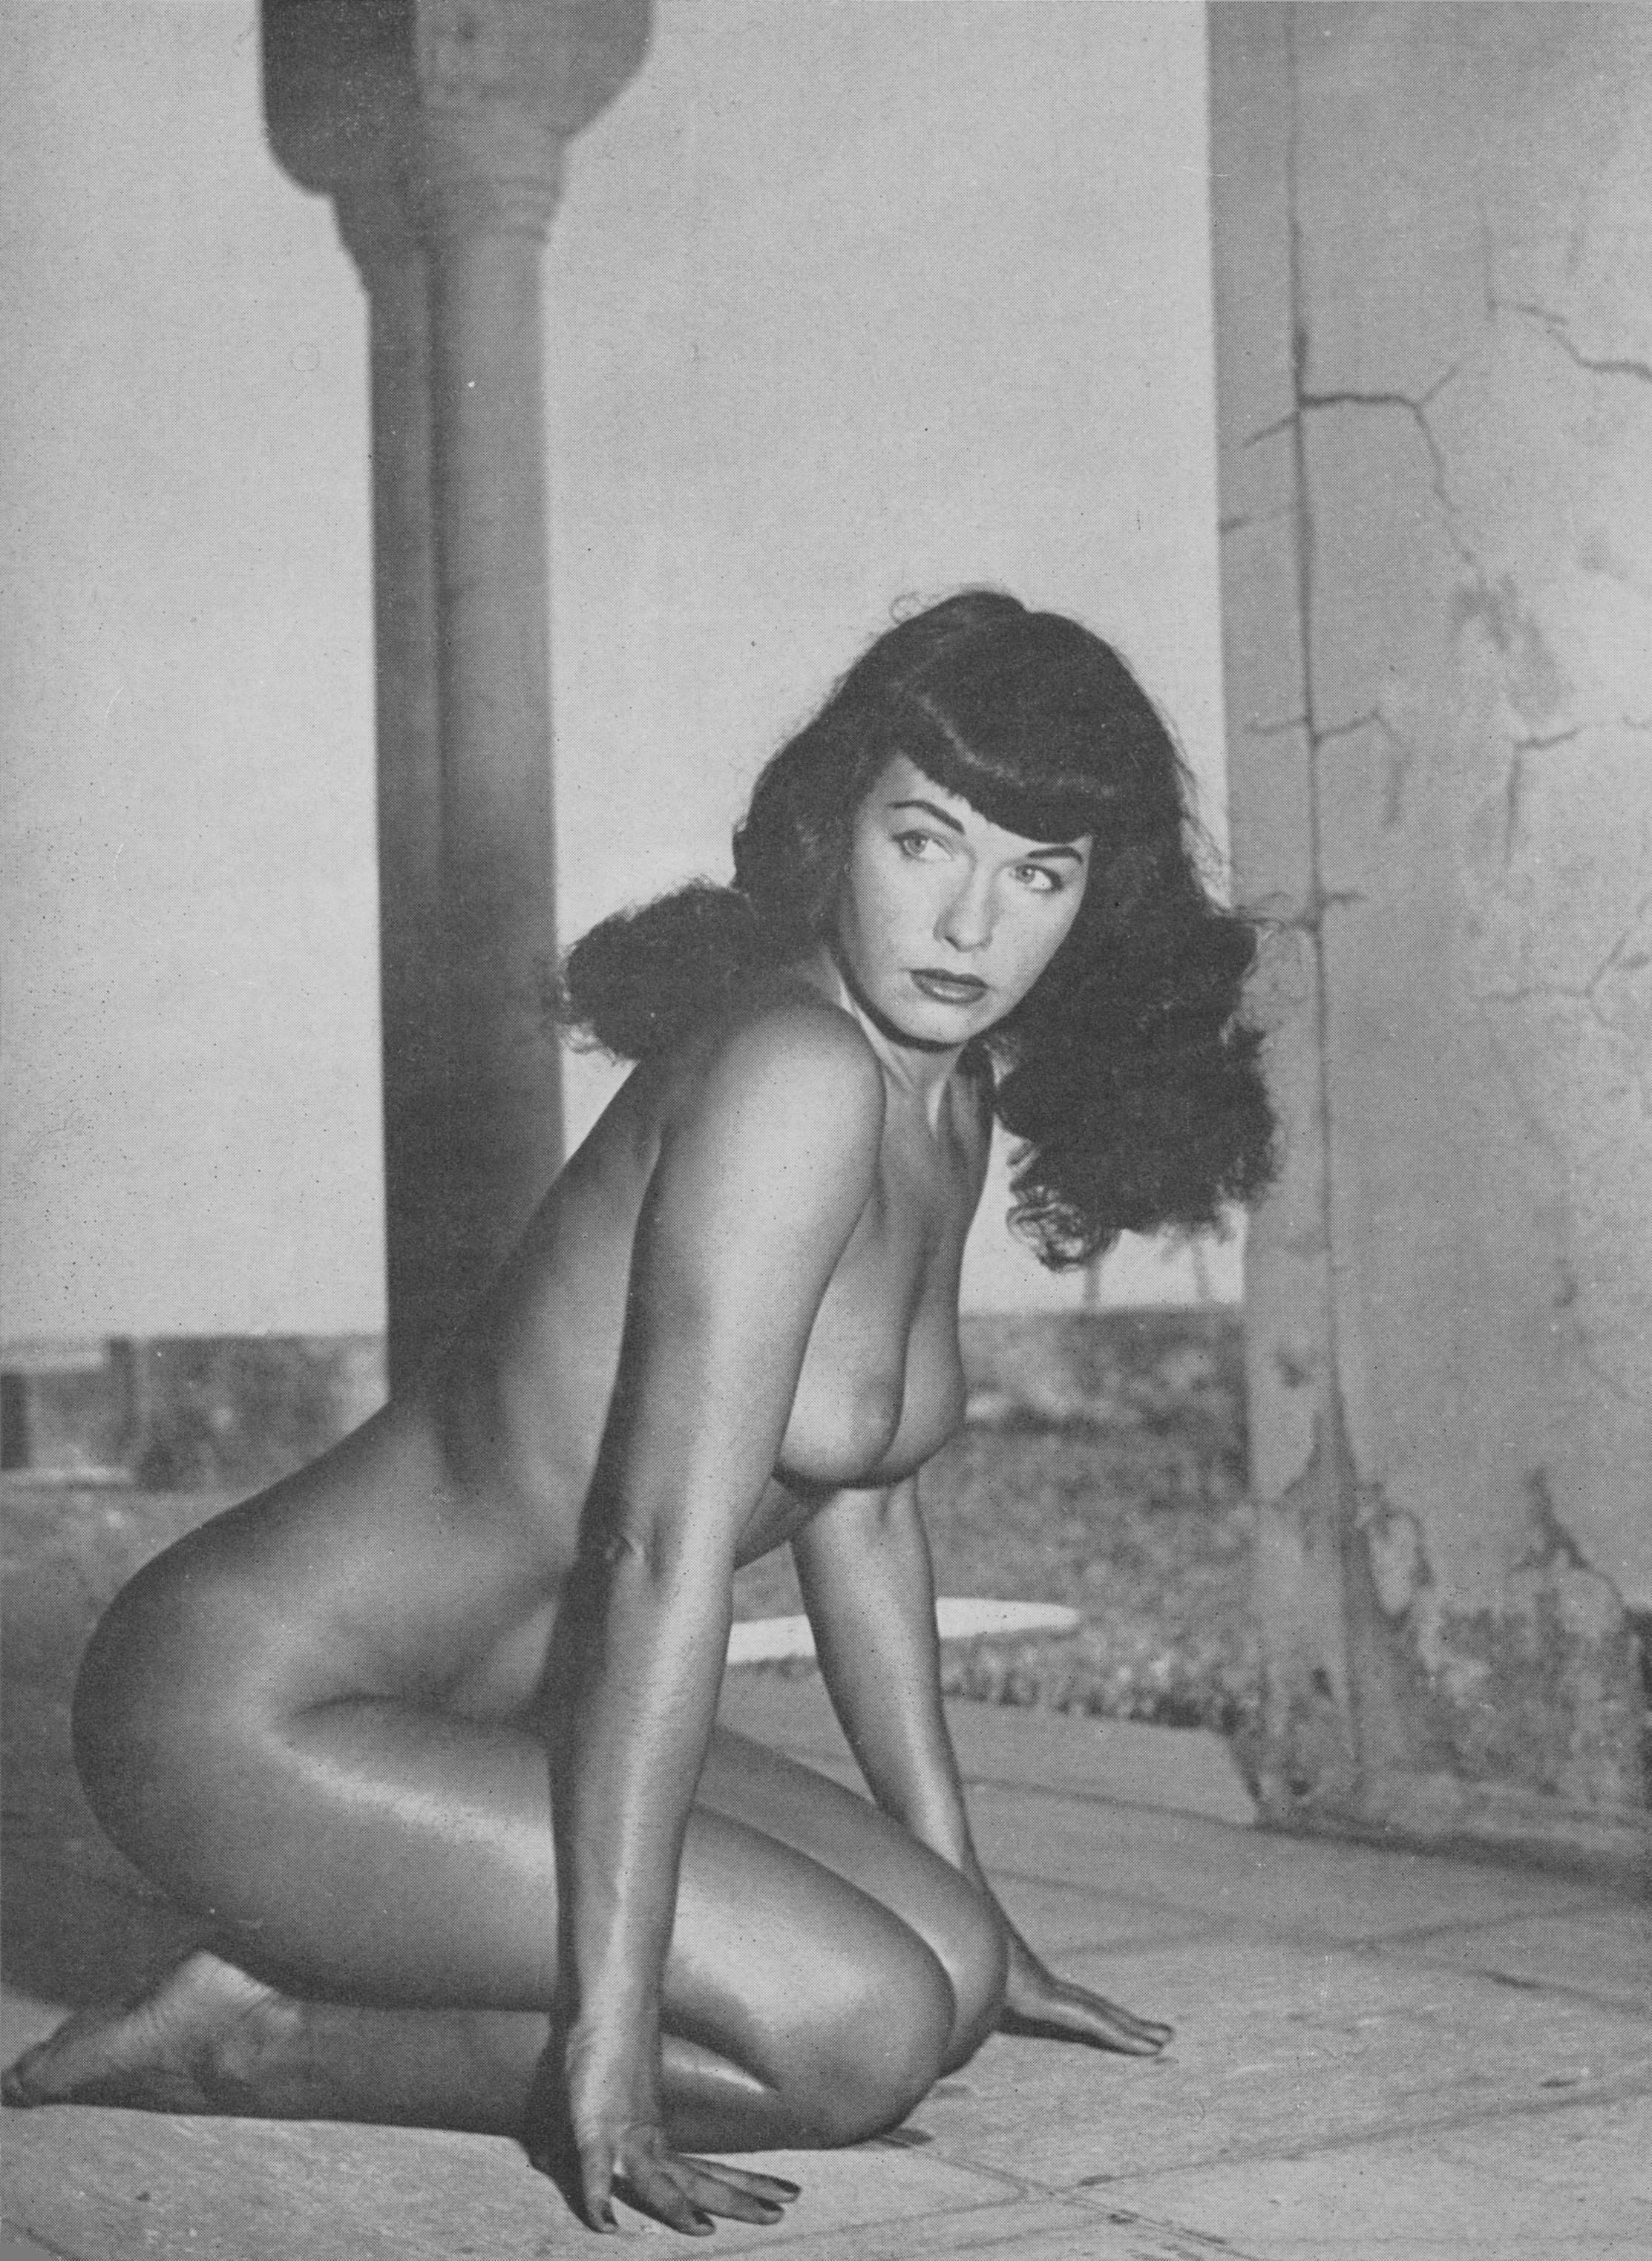 Betty kennedy nude, wwe melina porn videos